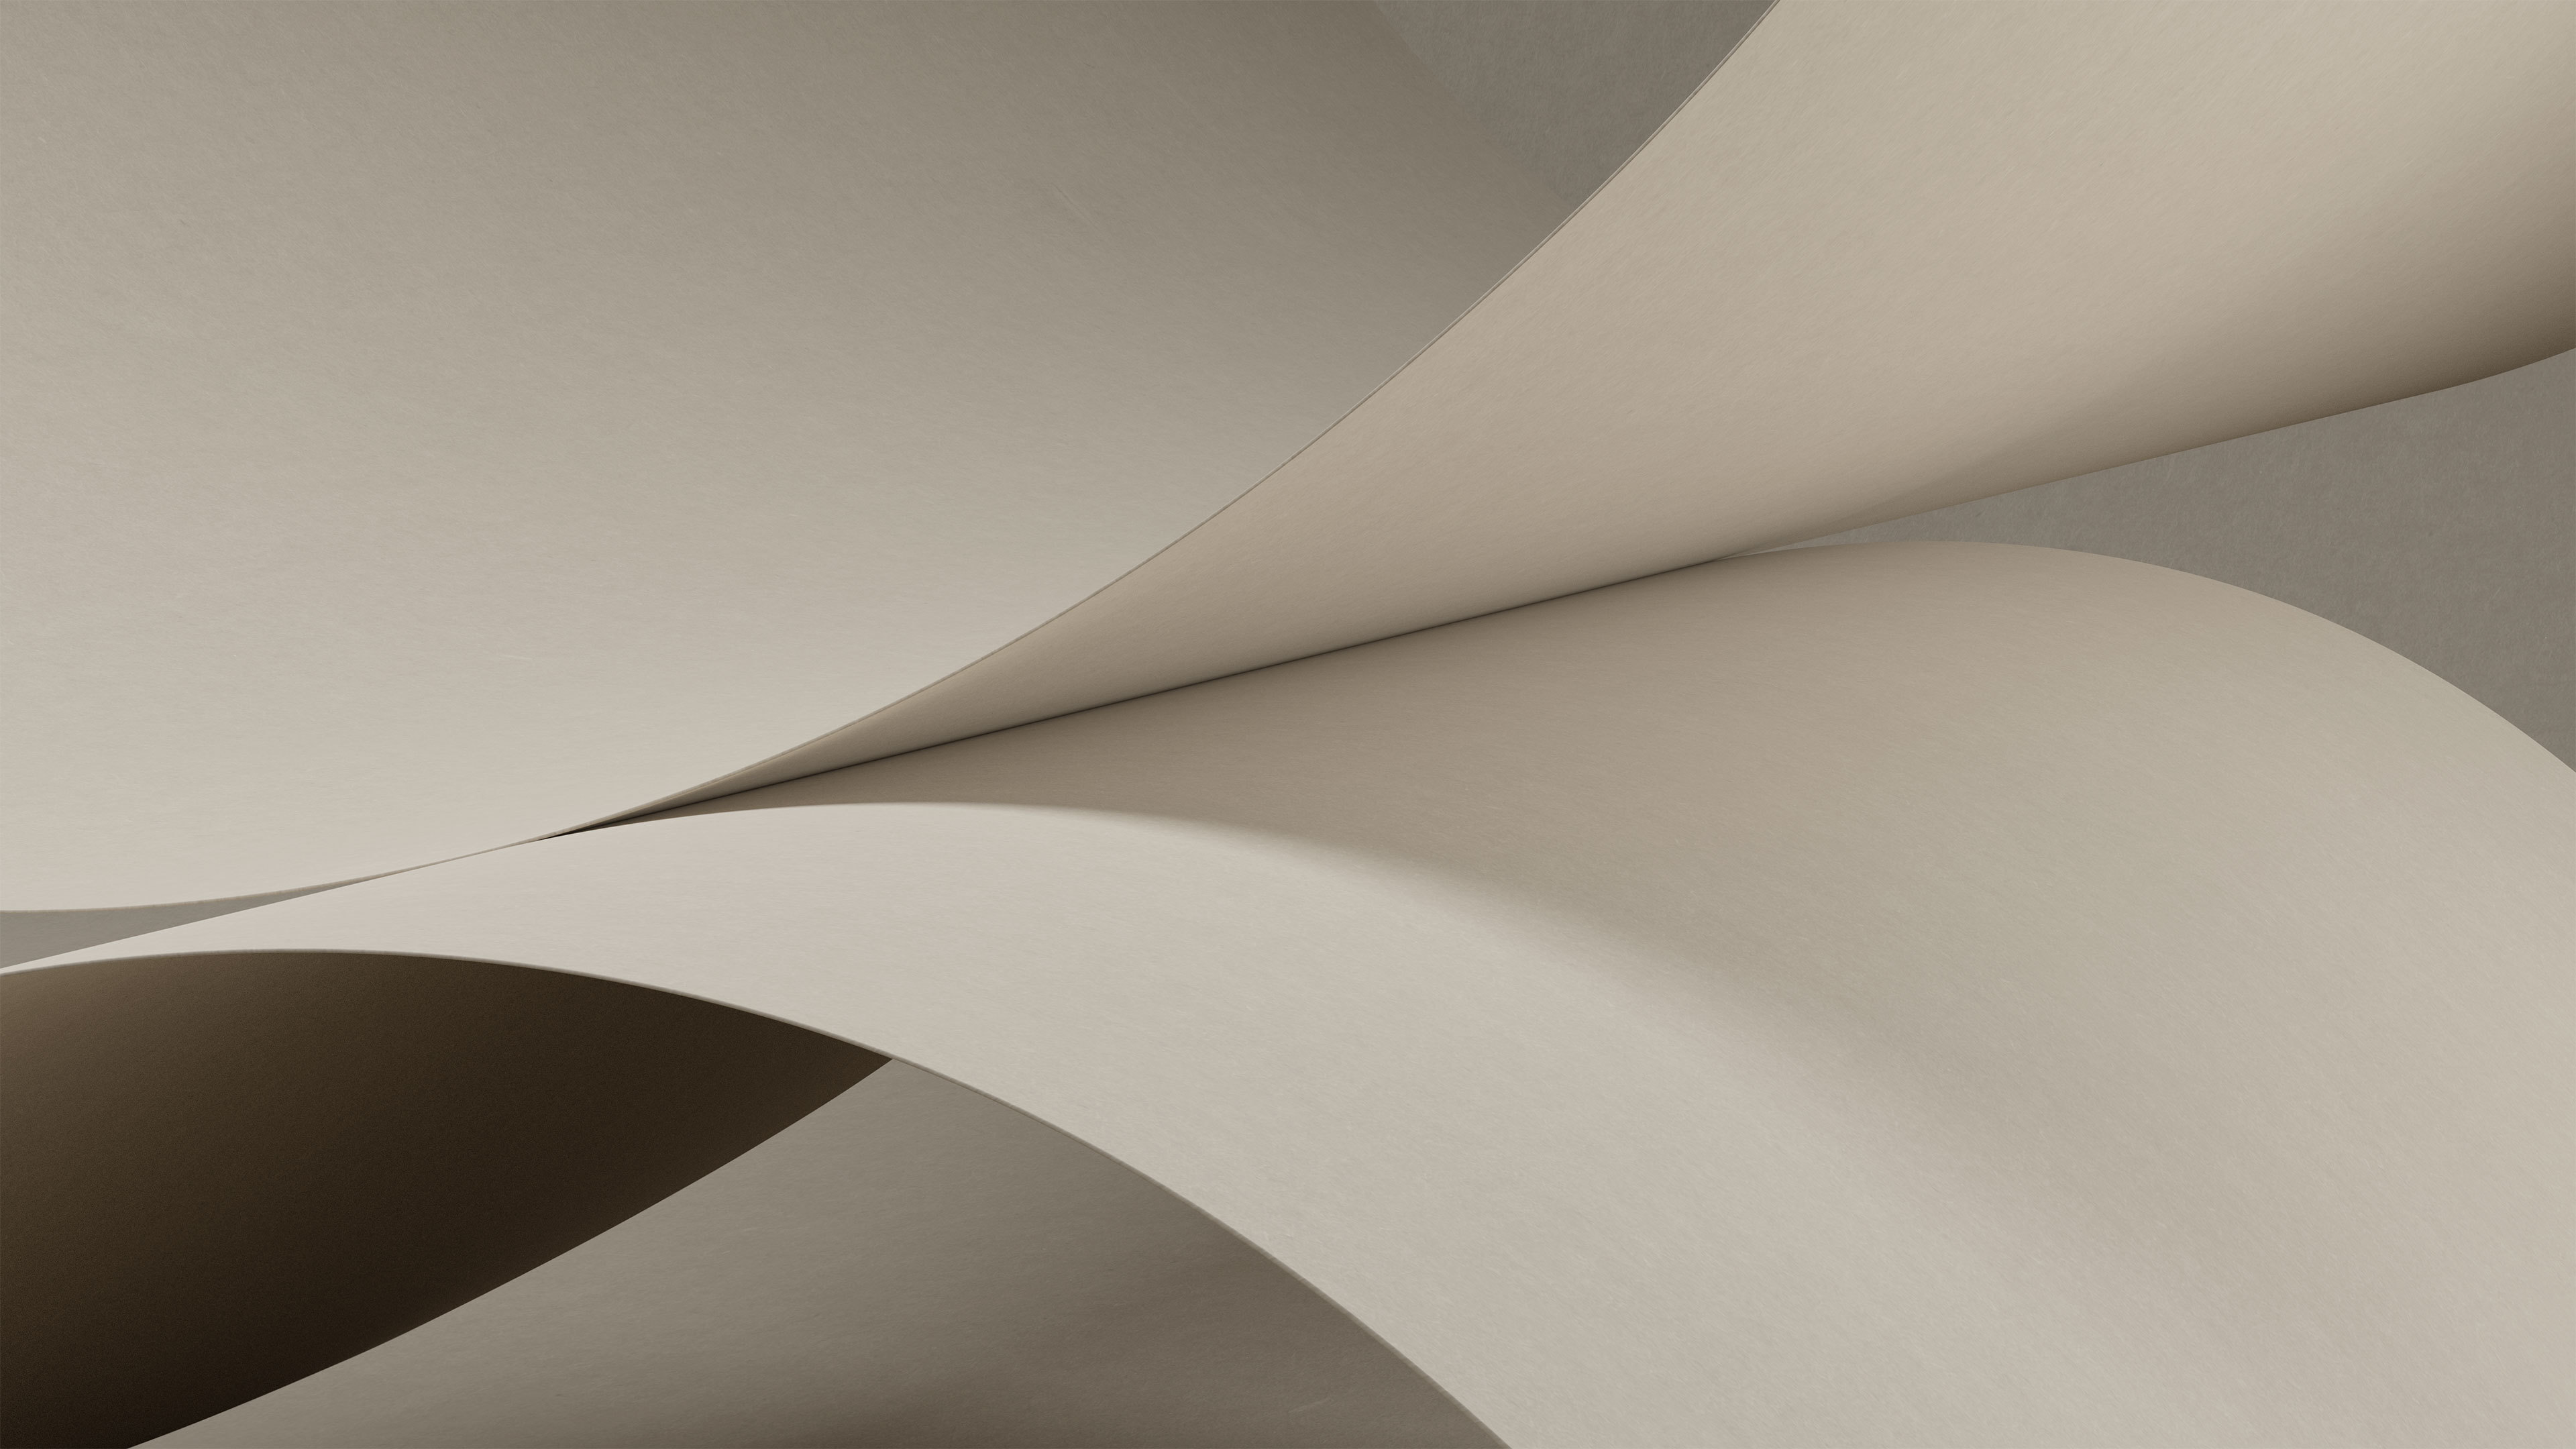 Landscape debrauw paper warm grey high res 3